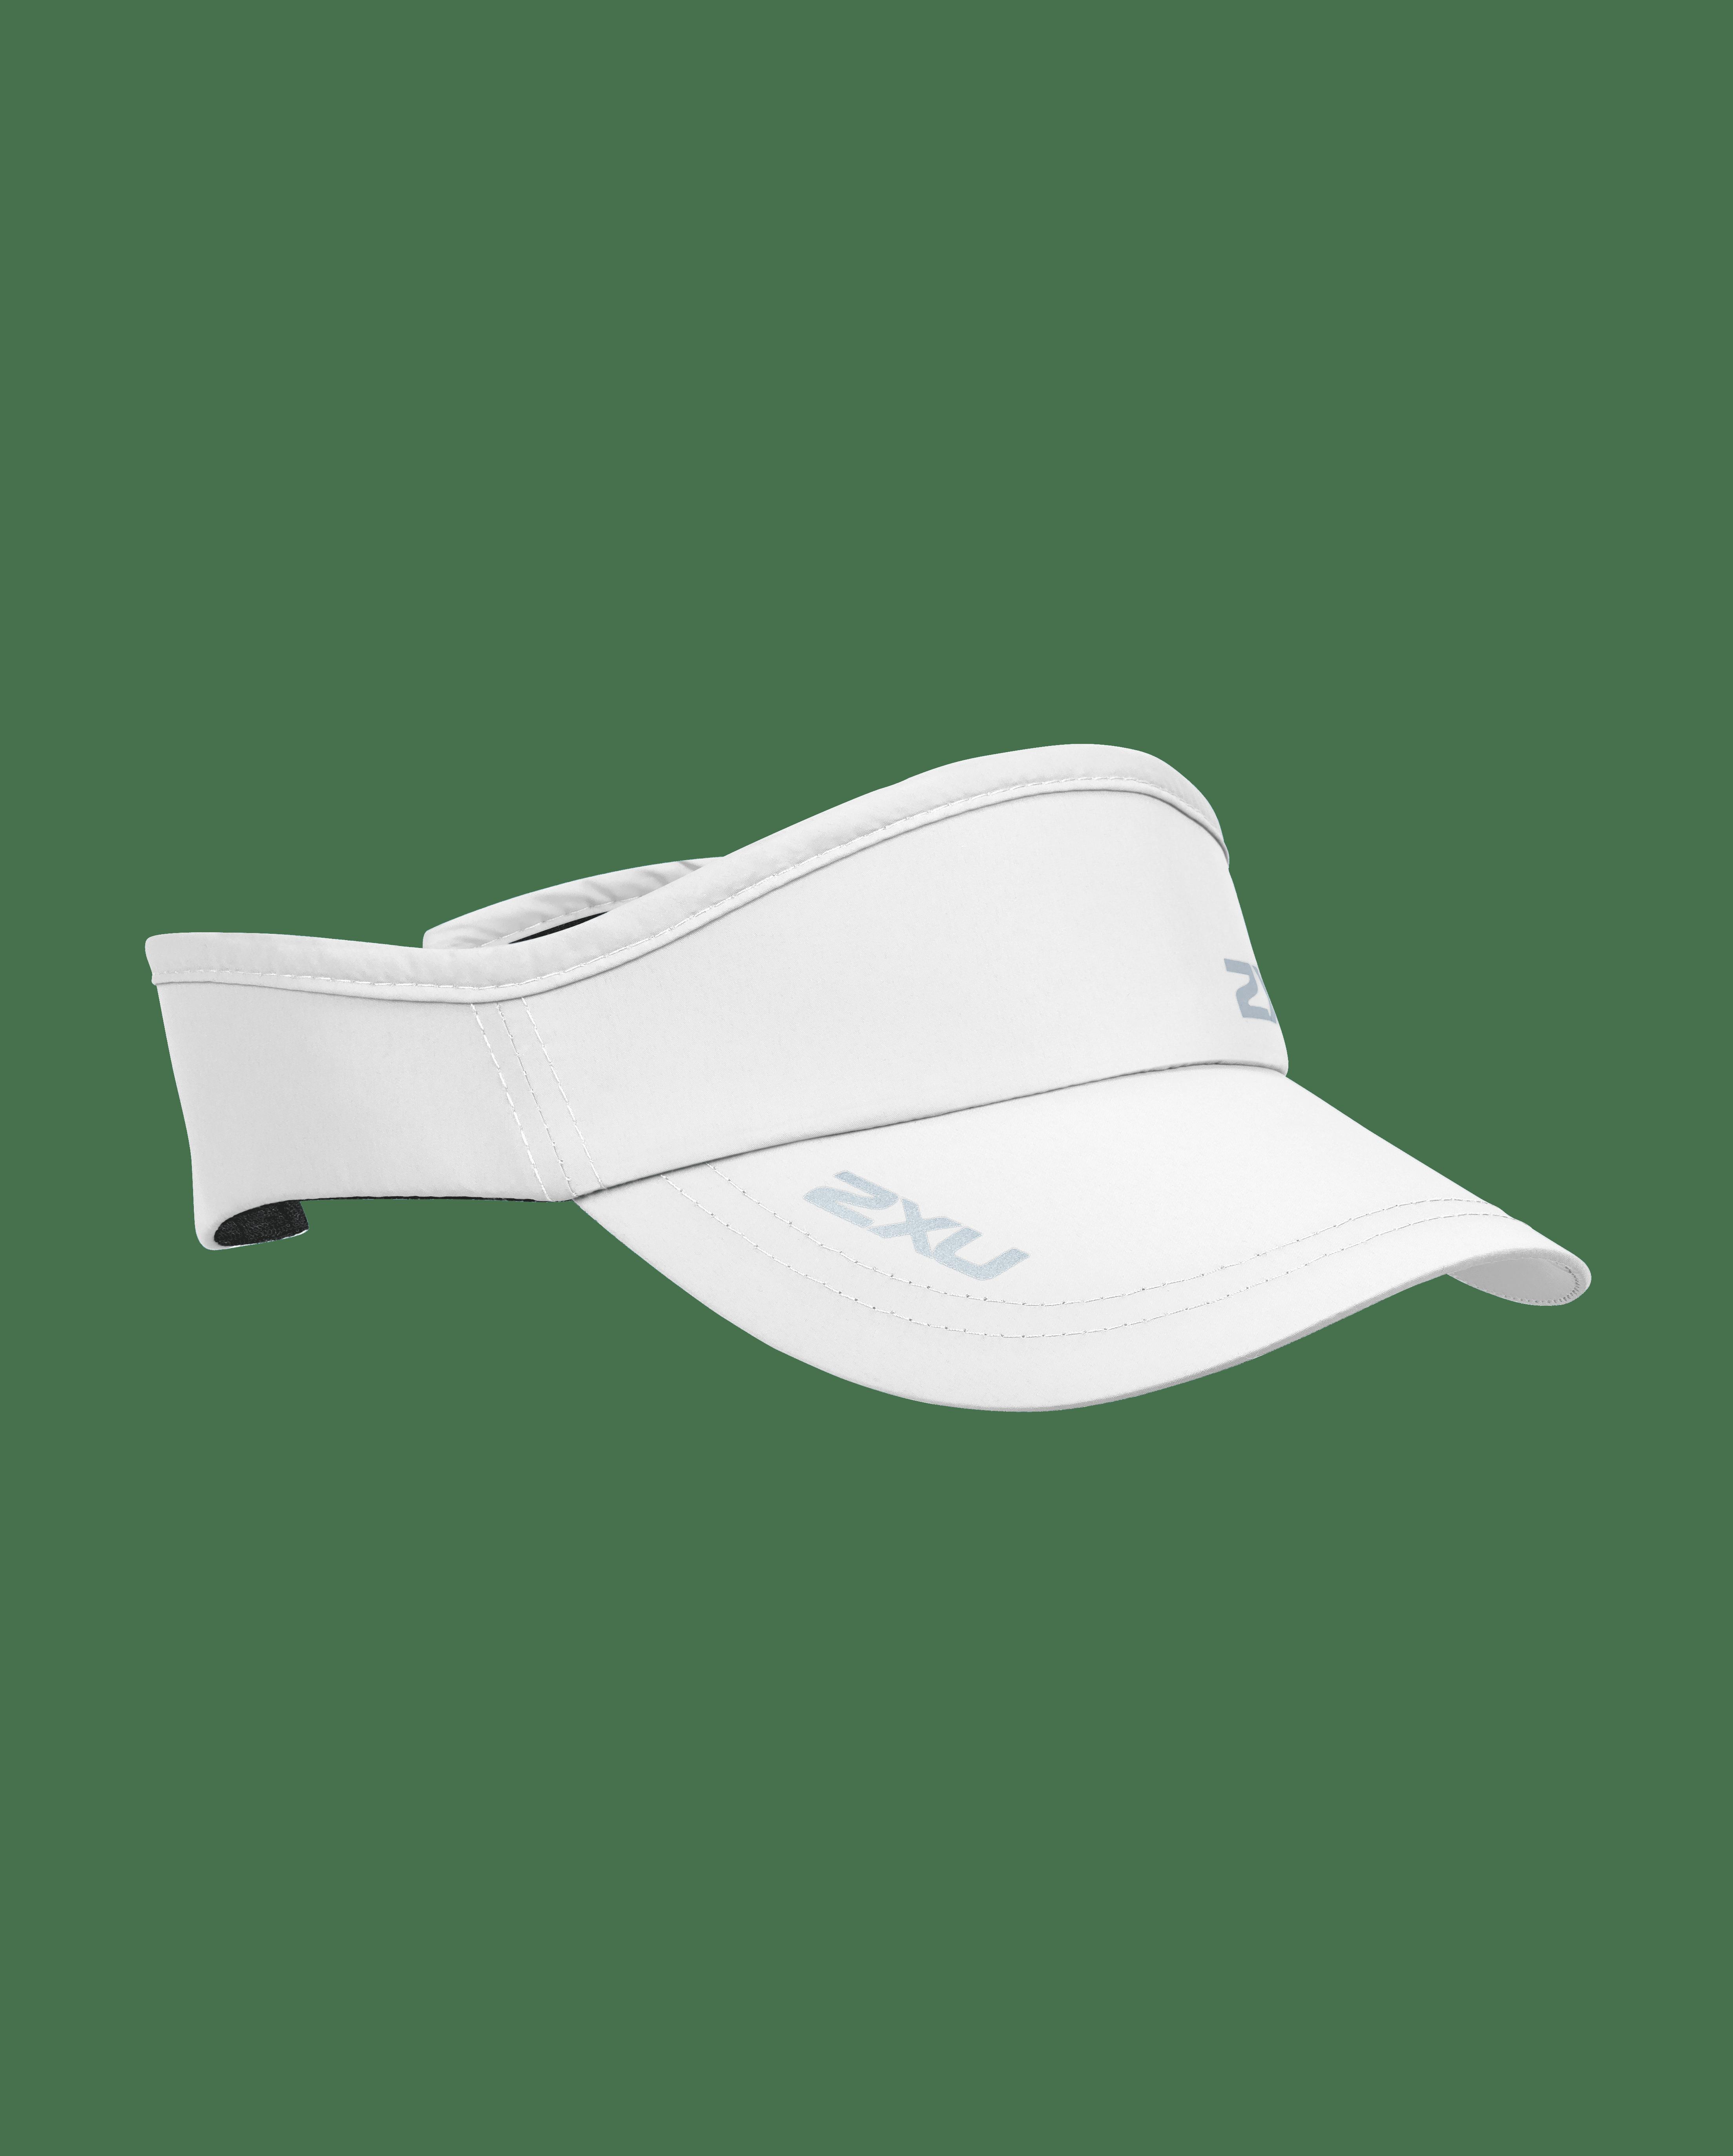 2XU Unisex Run Visor - White/White